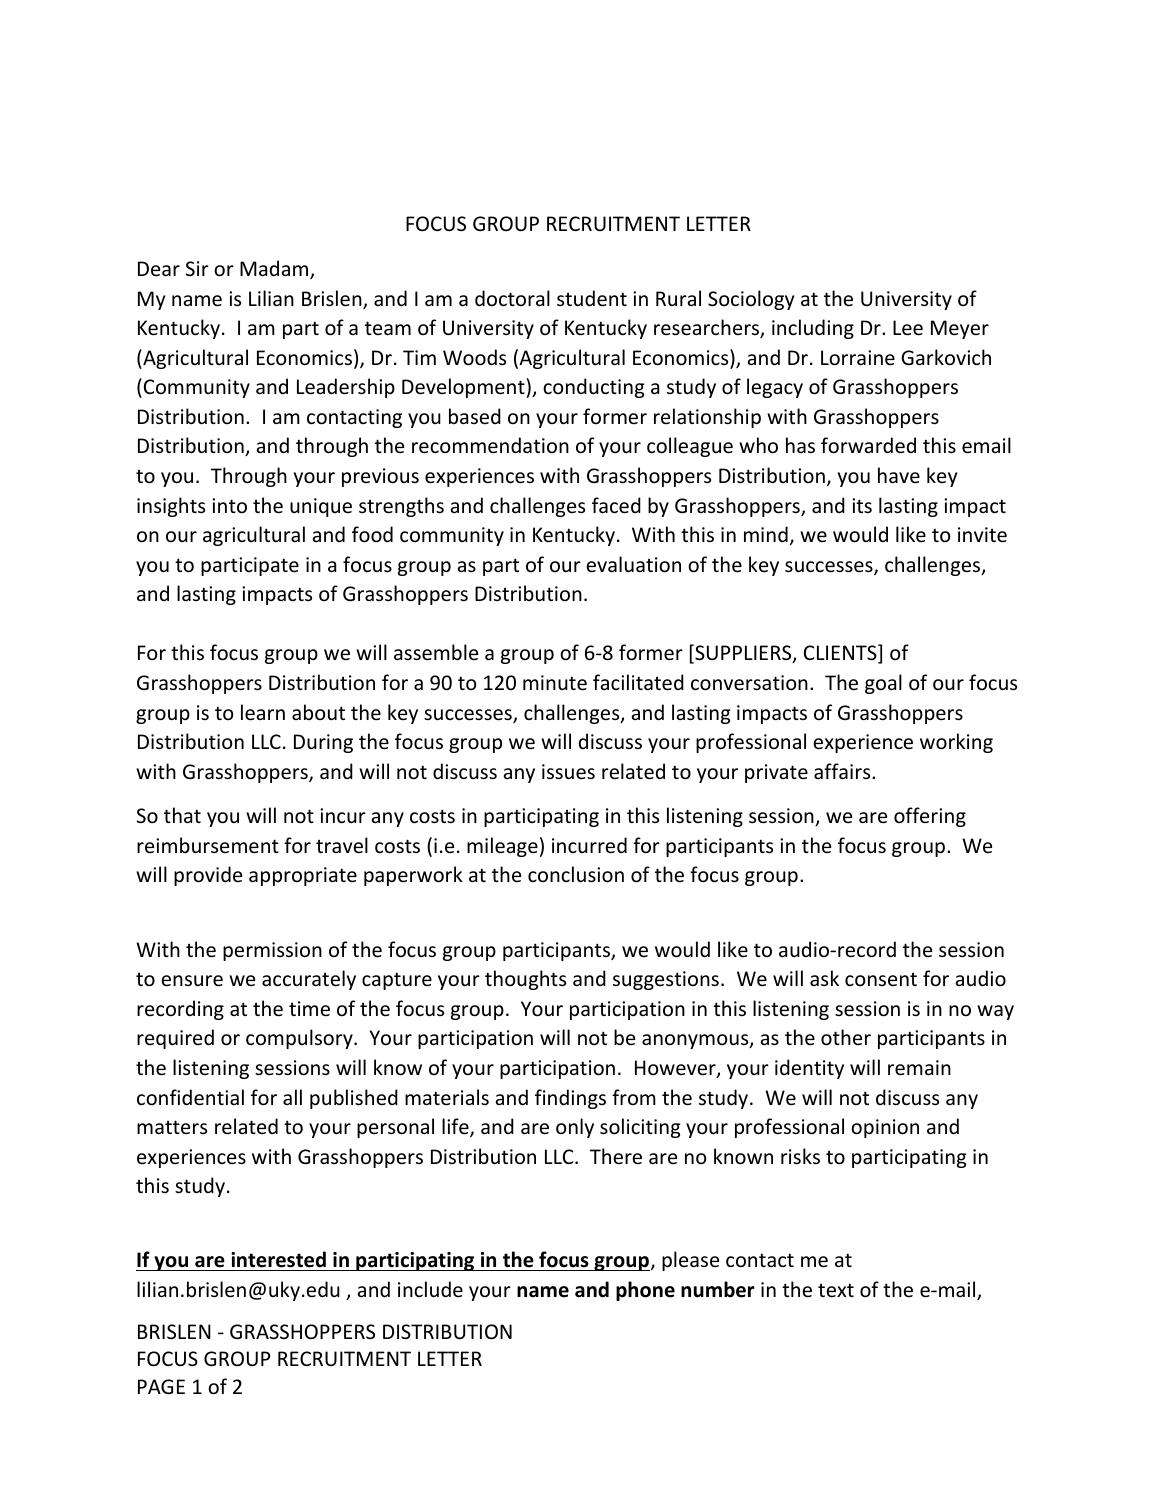 Focus group recruitment letter by Community Farm Alliance